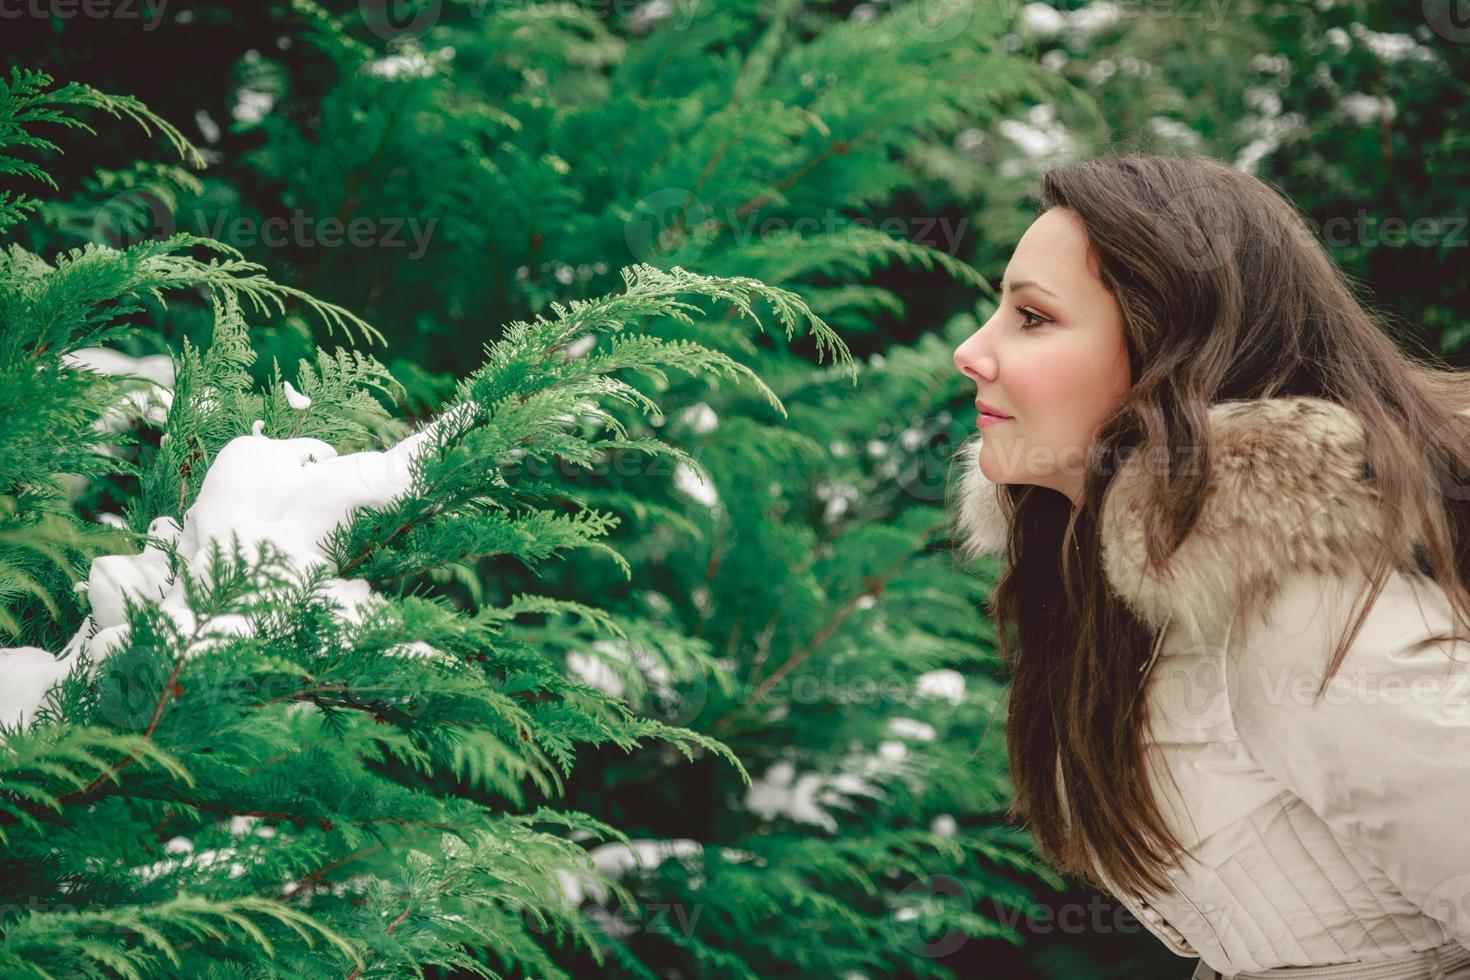 menina olhando para a árvore foto